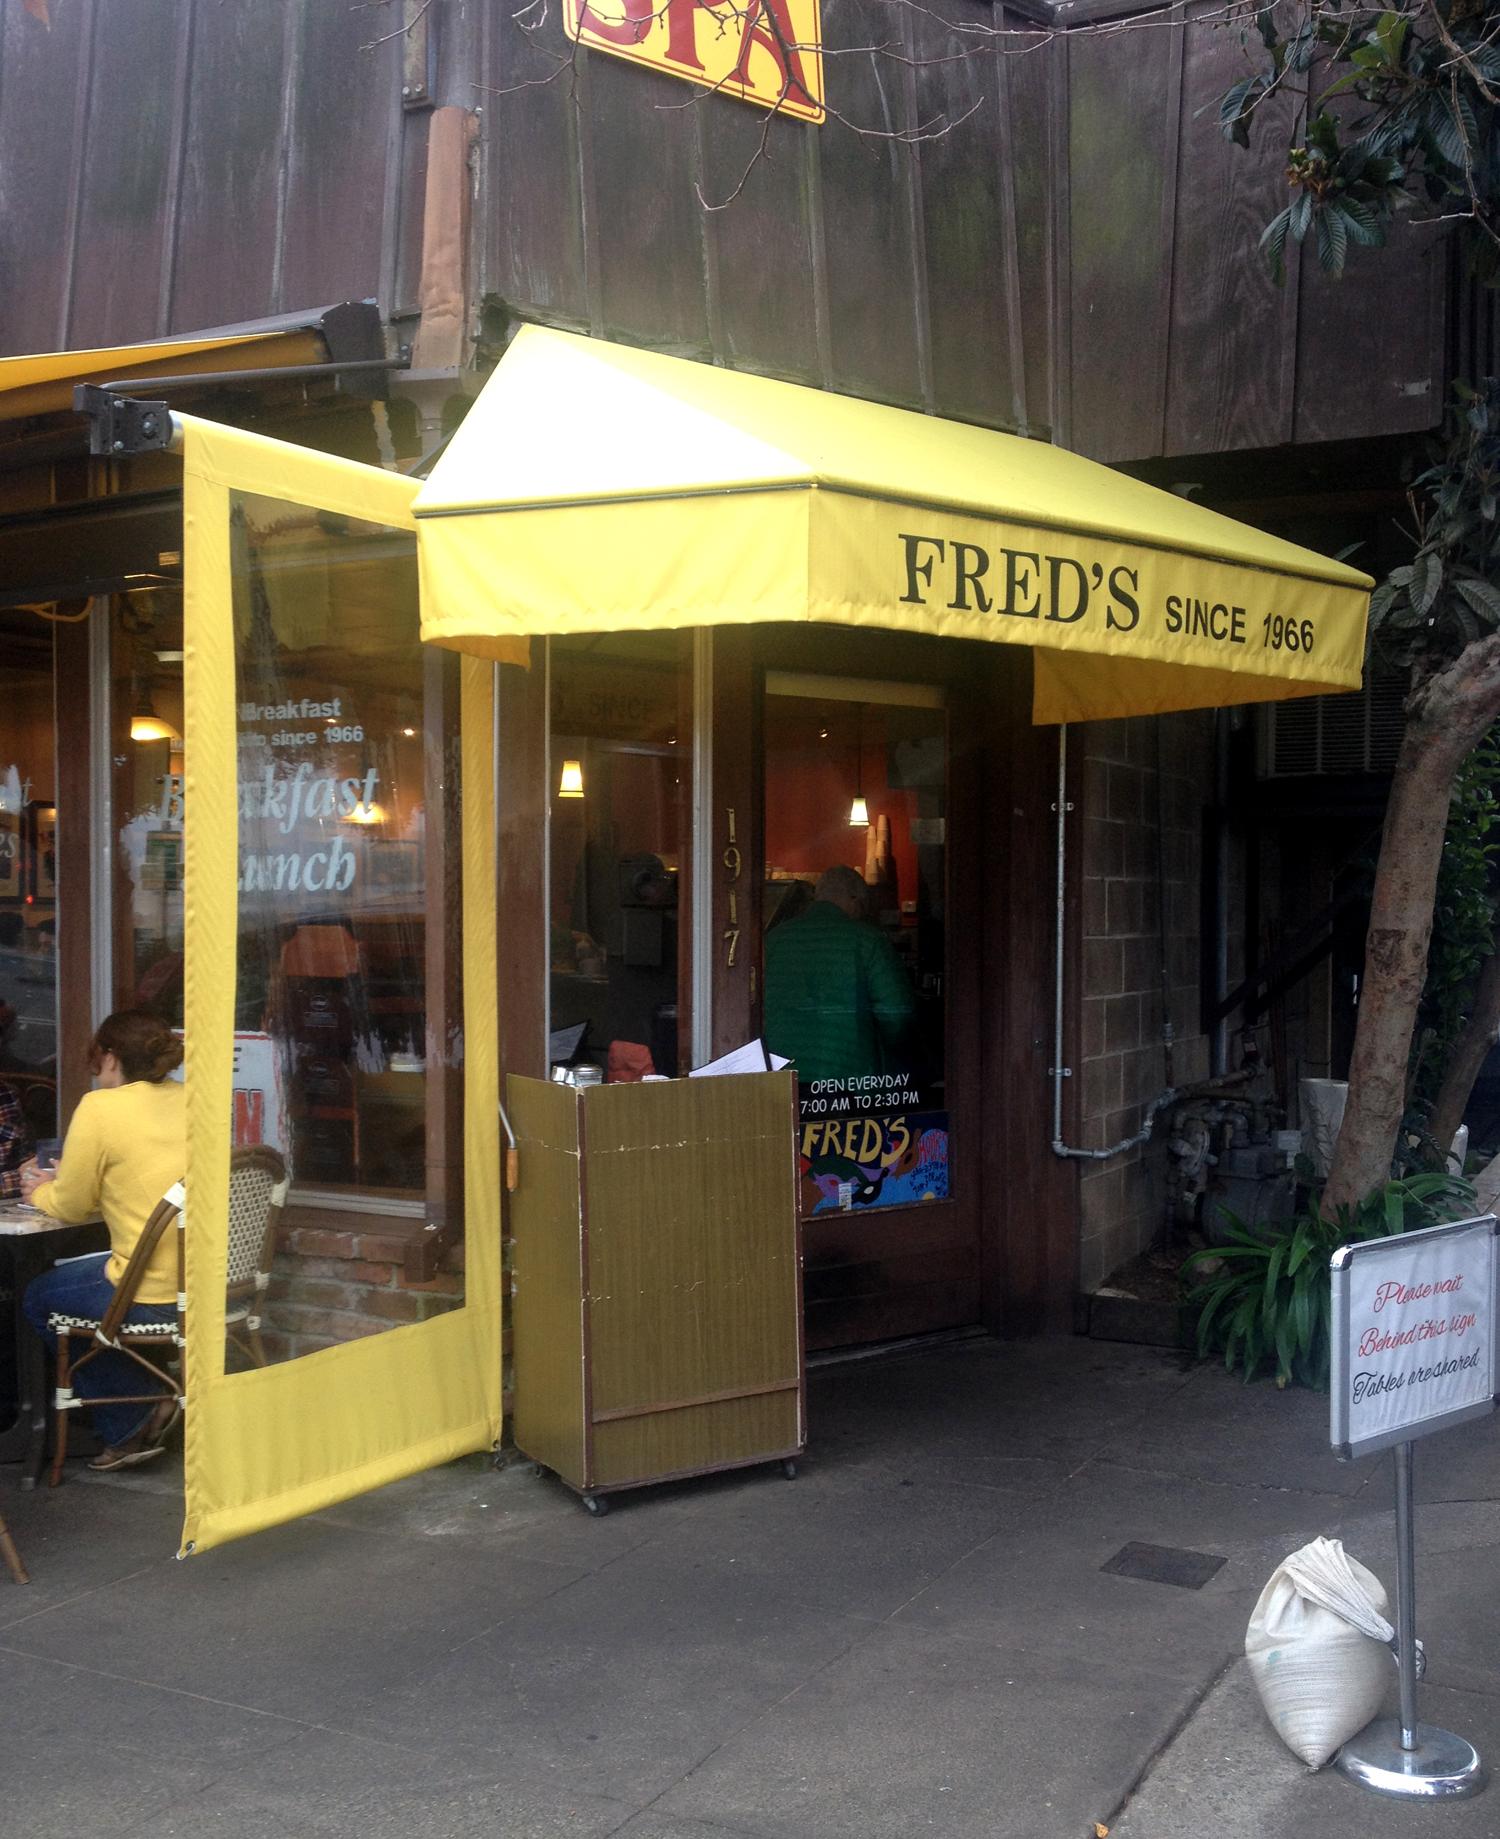 Fred's in Sausalito, CA